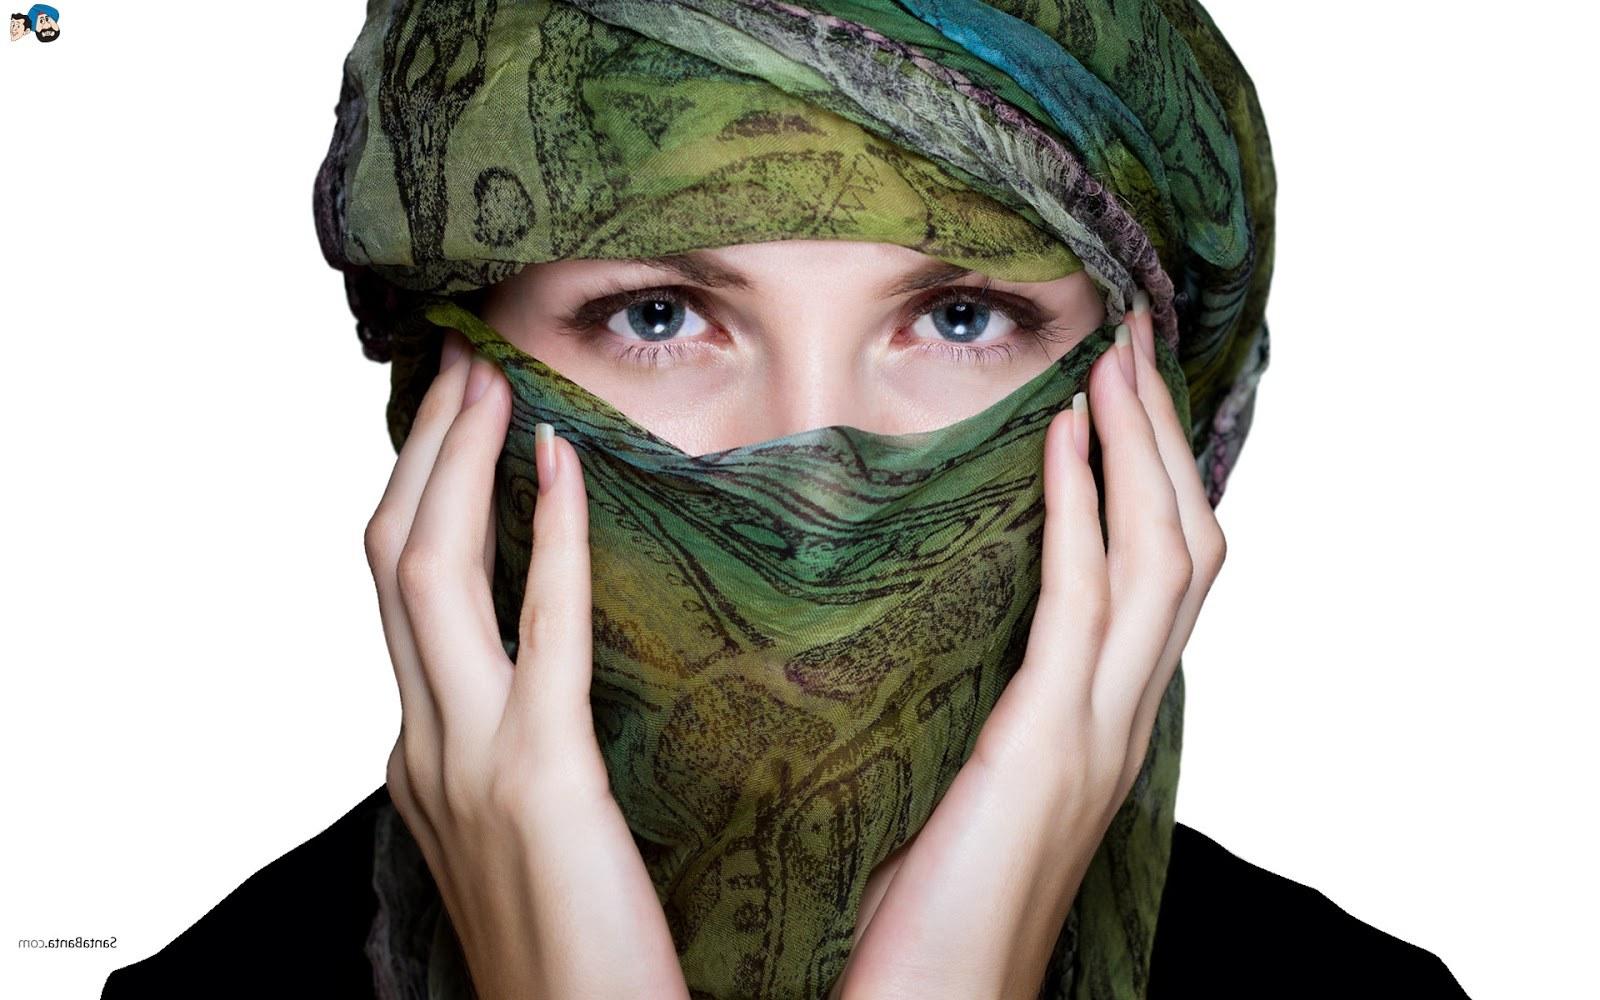 Design Muslimah Bercadar Memanah Xtd6 Koleksi Wallpaper Wanita Muslimah Bercadar